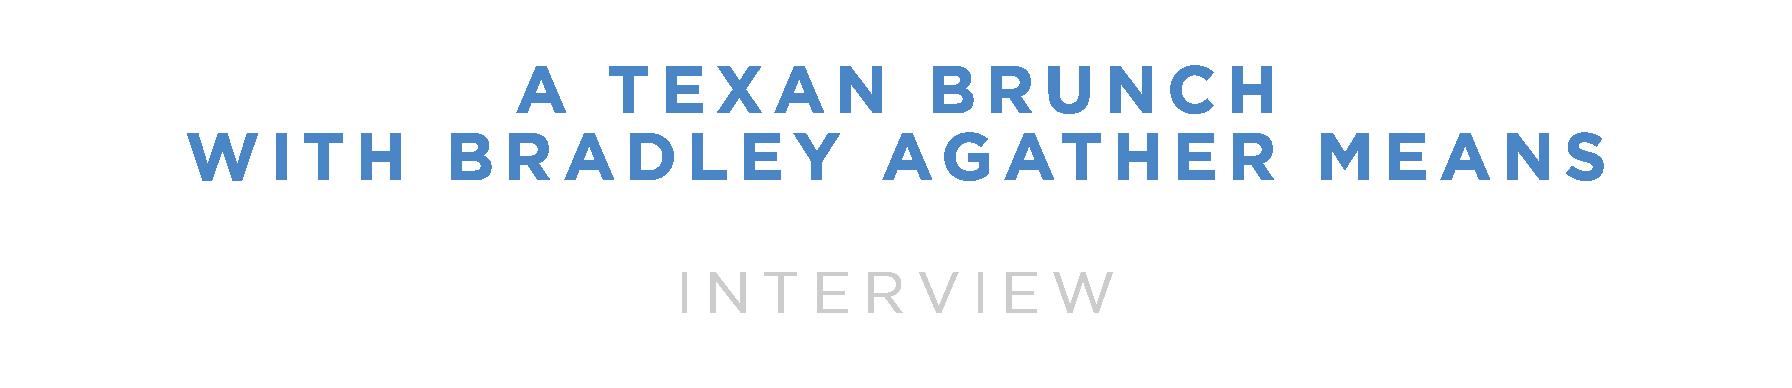 BradleyAgather_Title-01.png